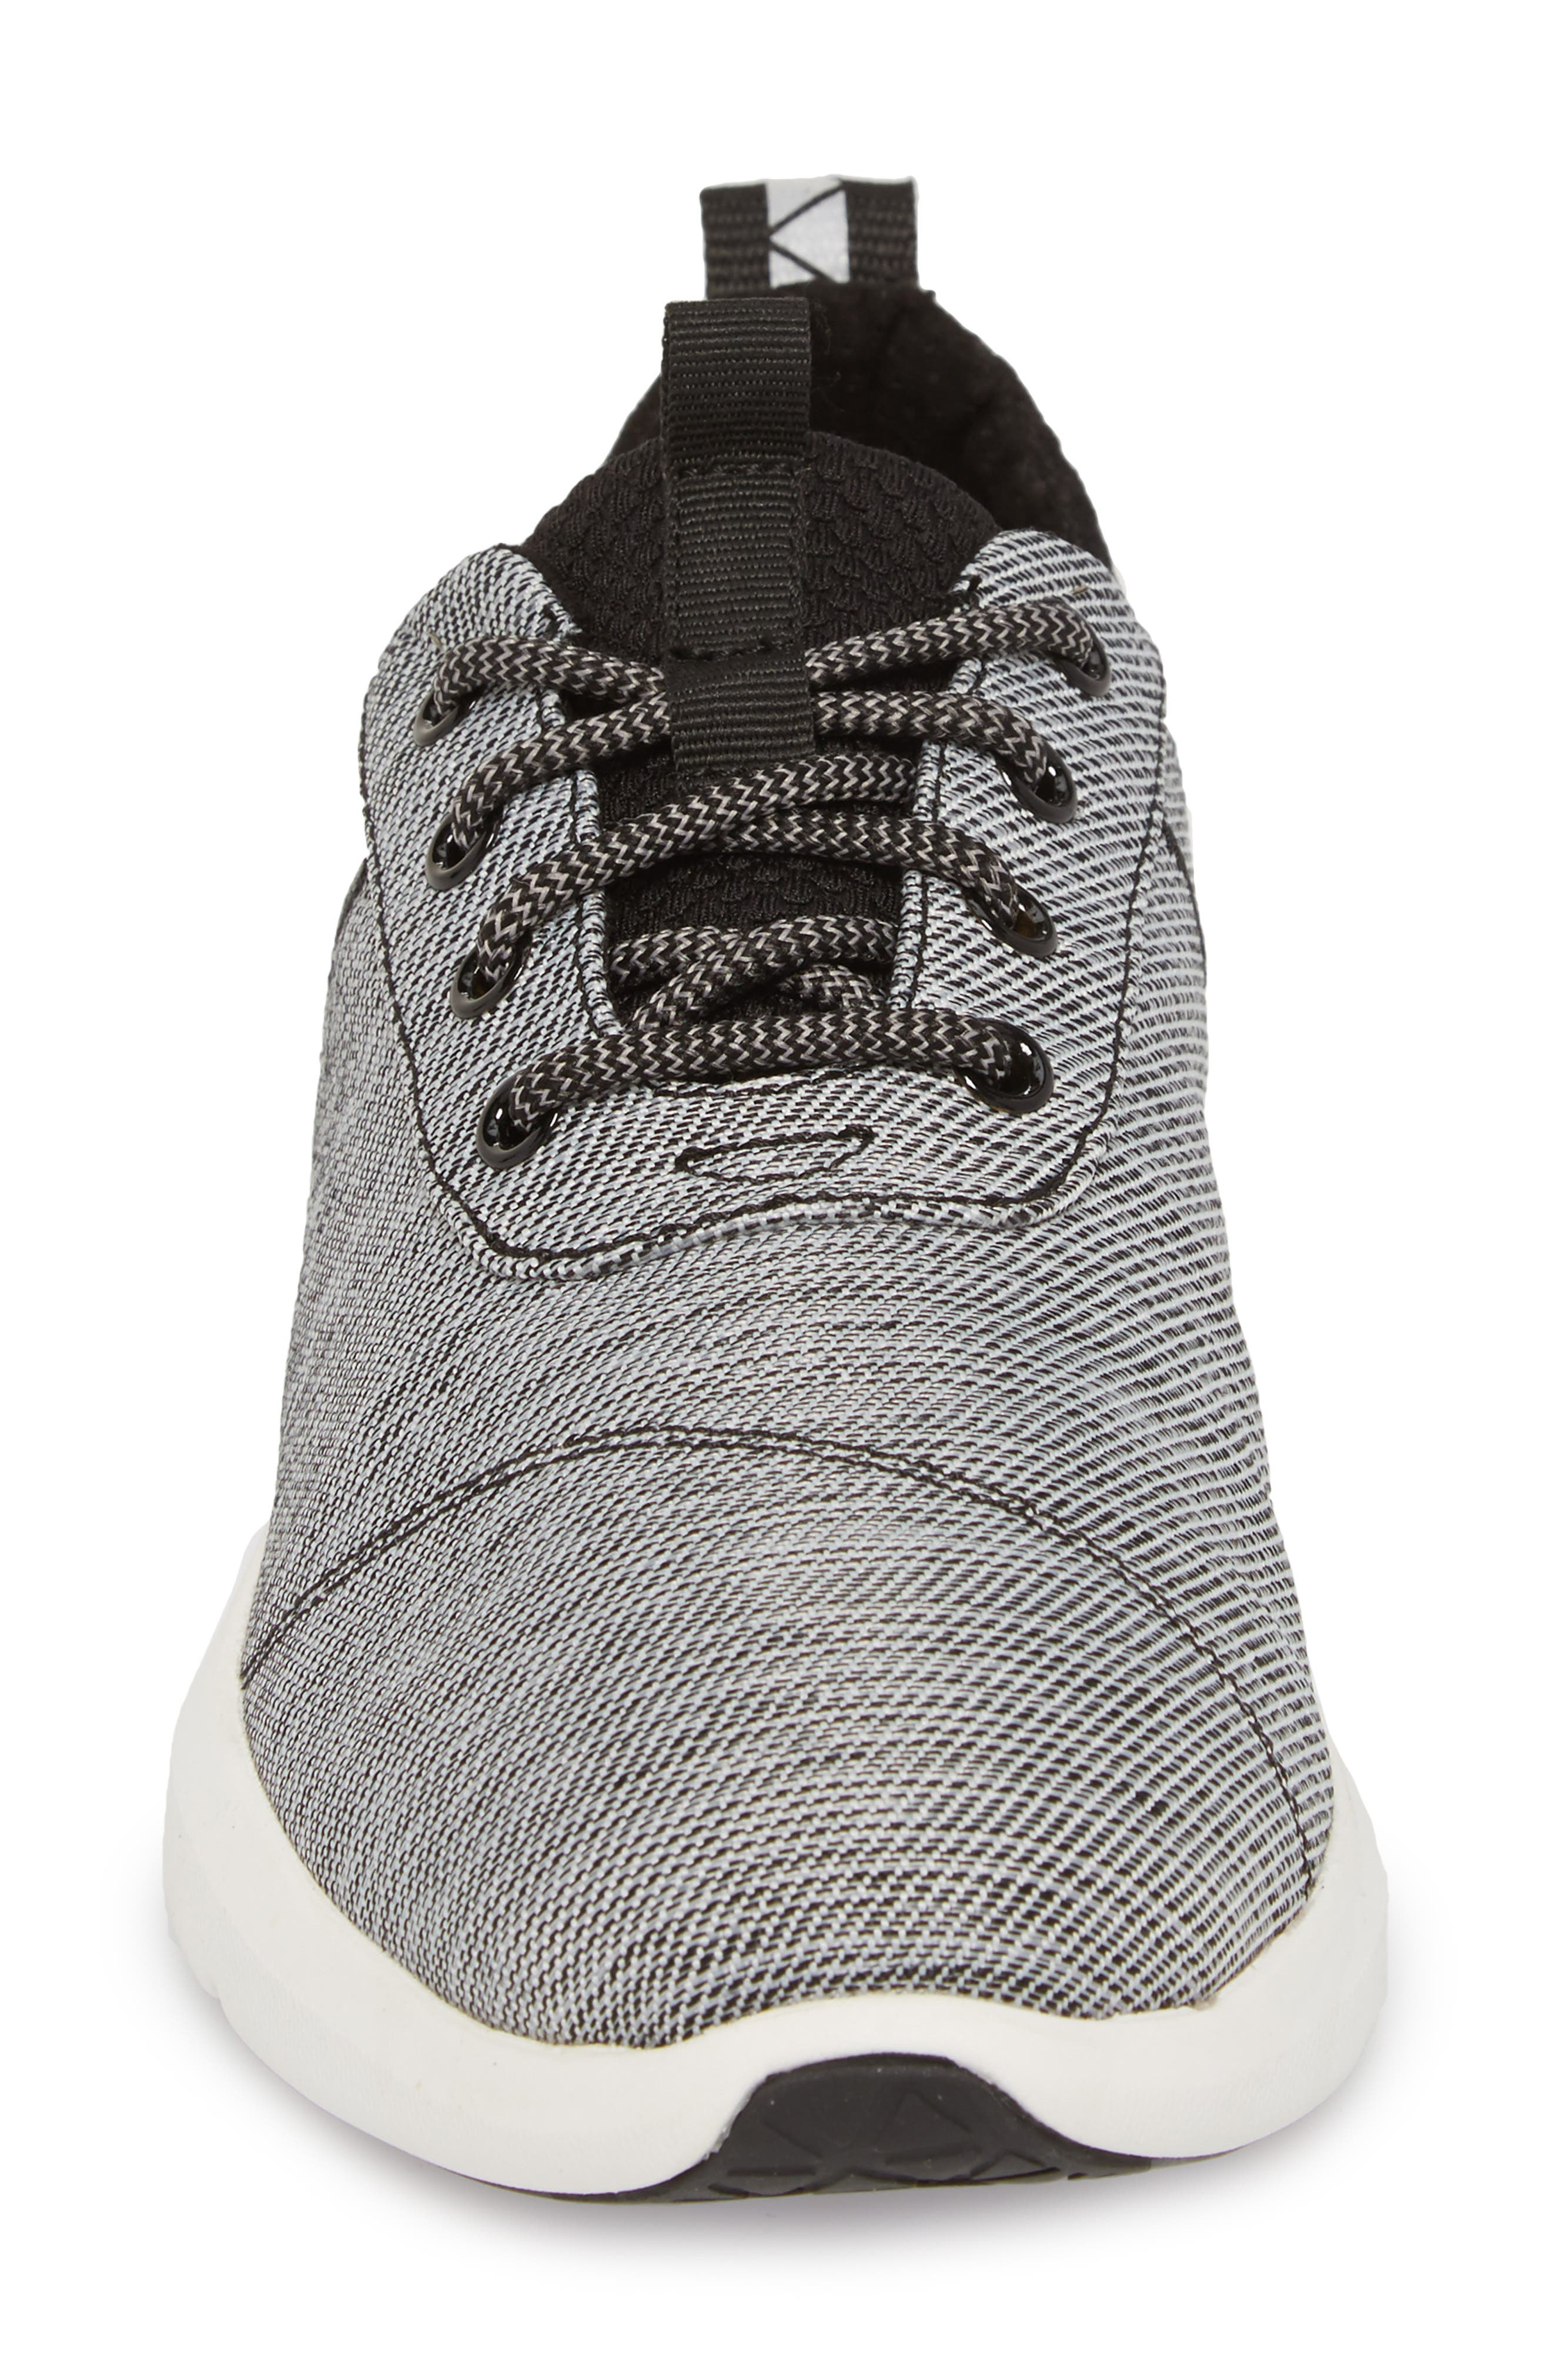 Cabrillo Sneaker,                             Alternate thumbnail 4, color,                             Black Space-Dye